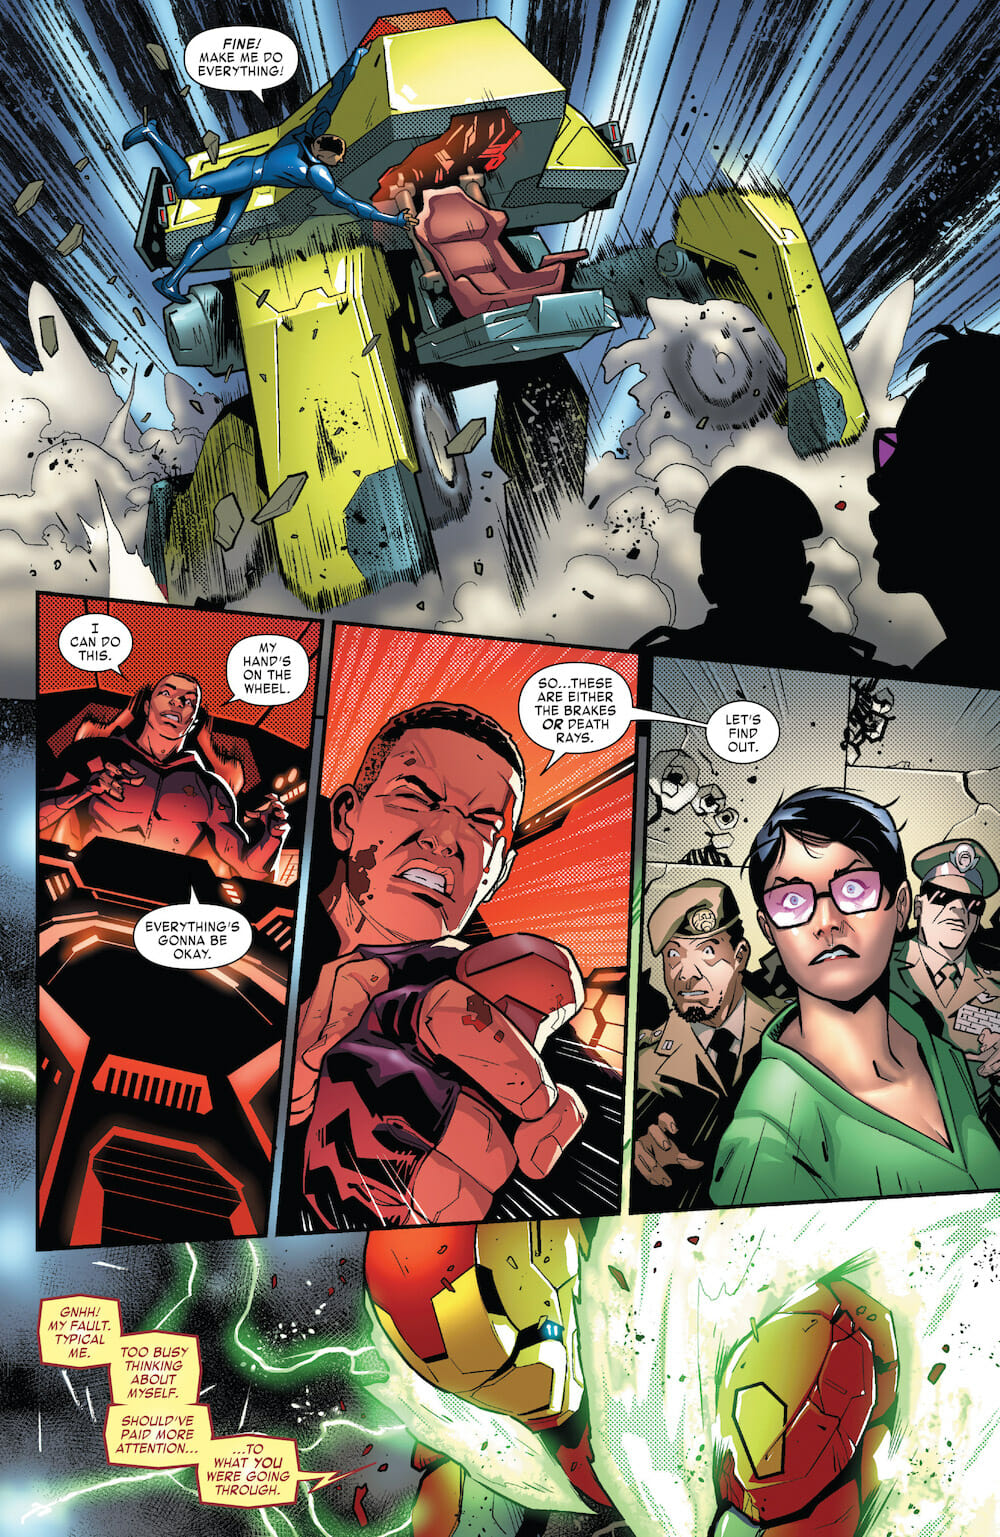 Tony Stark - Iron Man #2 Review - Comic Book Revolution